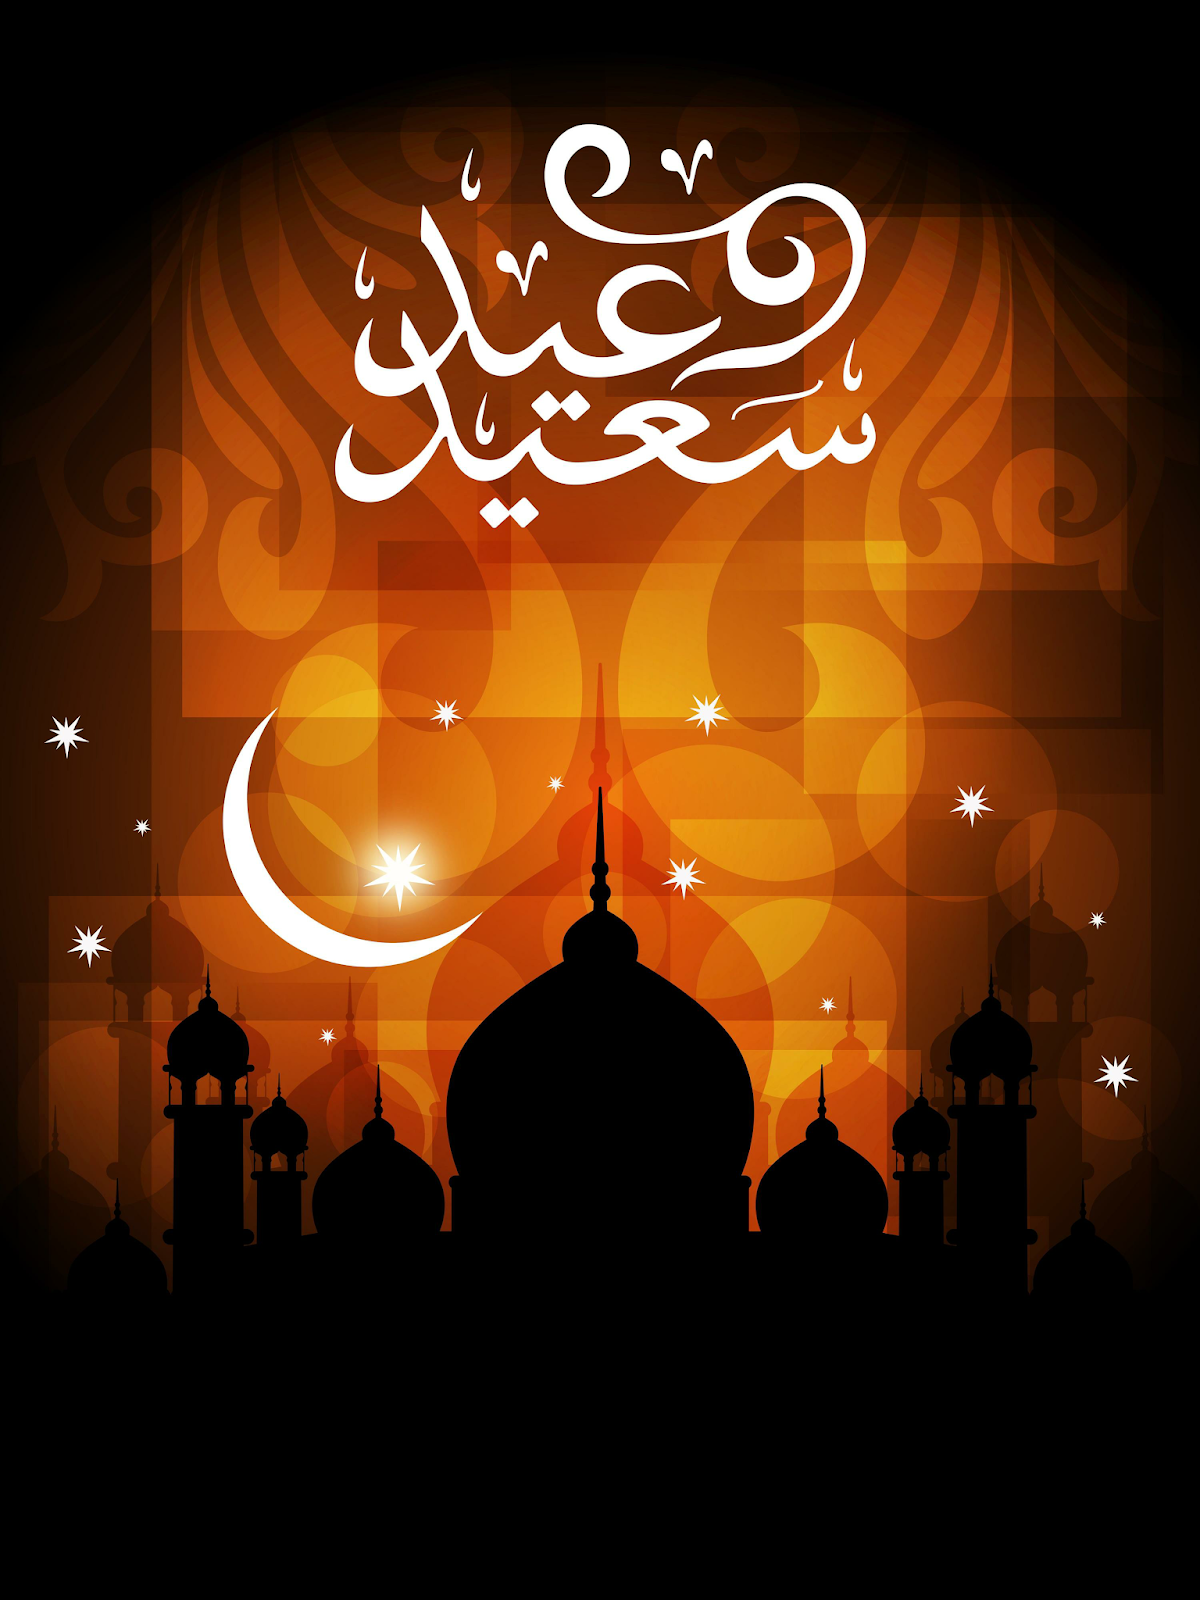 Eid greetings and gifs eid mubarak wishes eid gifs for whatsapp eid greetings and gifs eid mubarak wishes eid gifs for whatsapp eid mubarak m4hsunfo